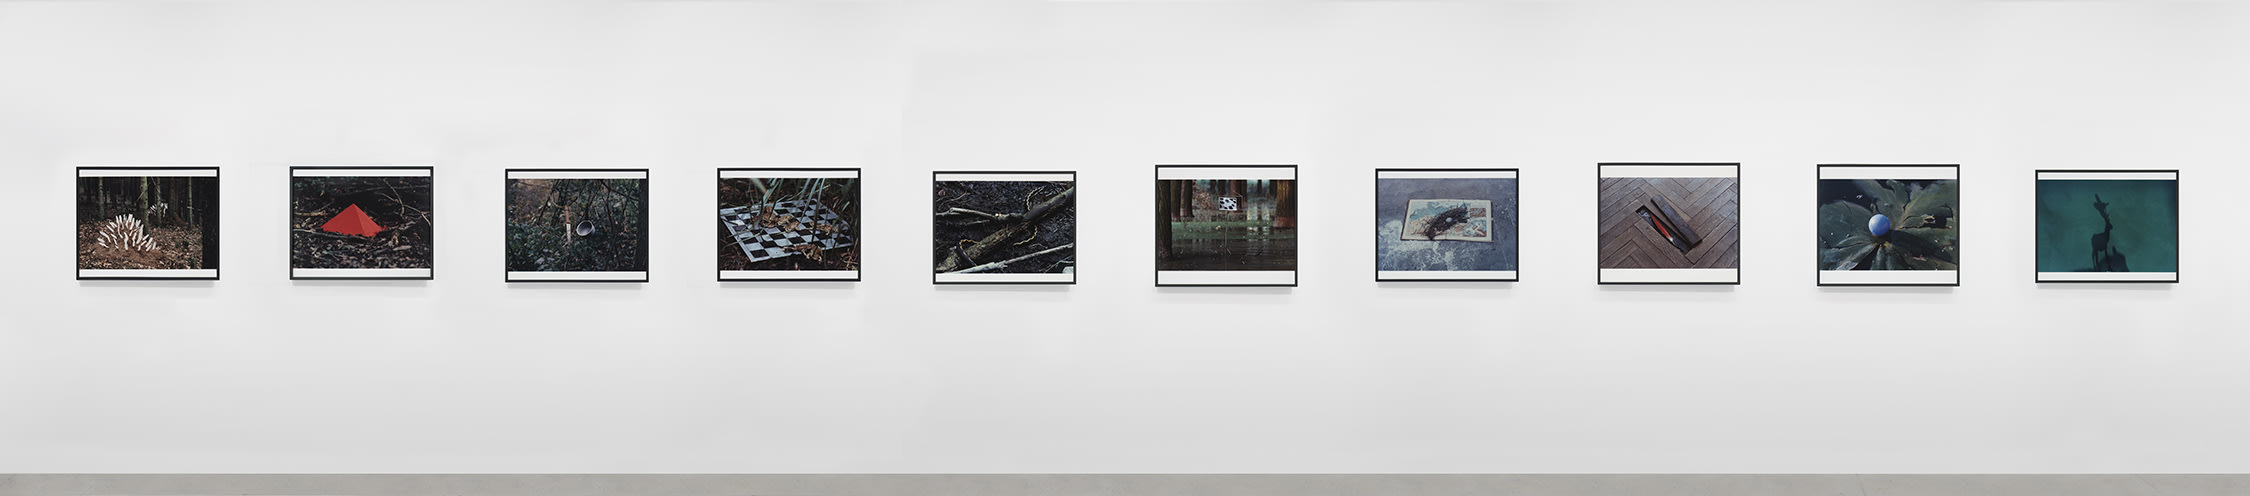 a series of photographs by Lothar Baumgarten